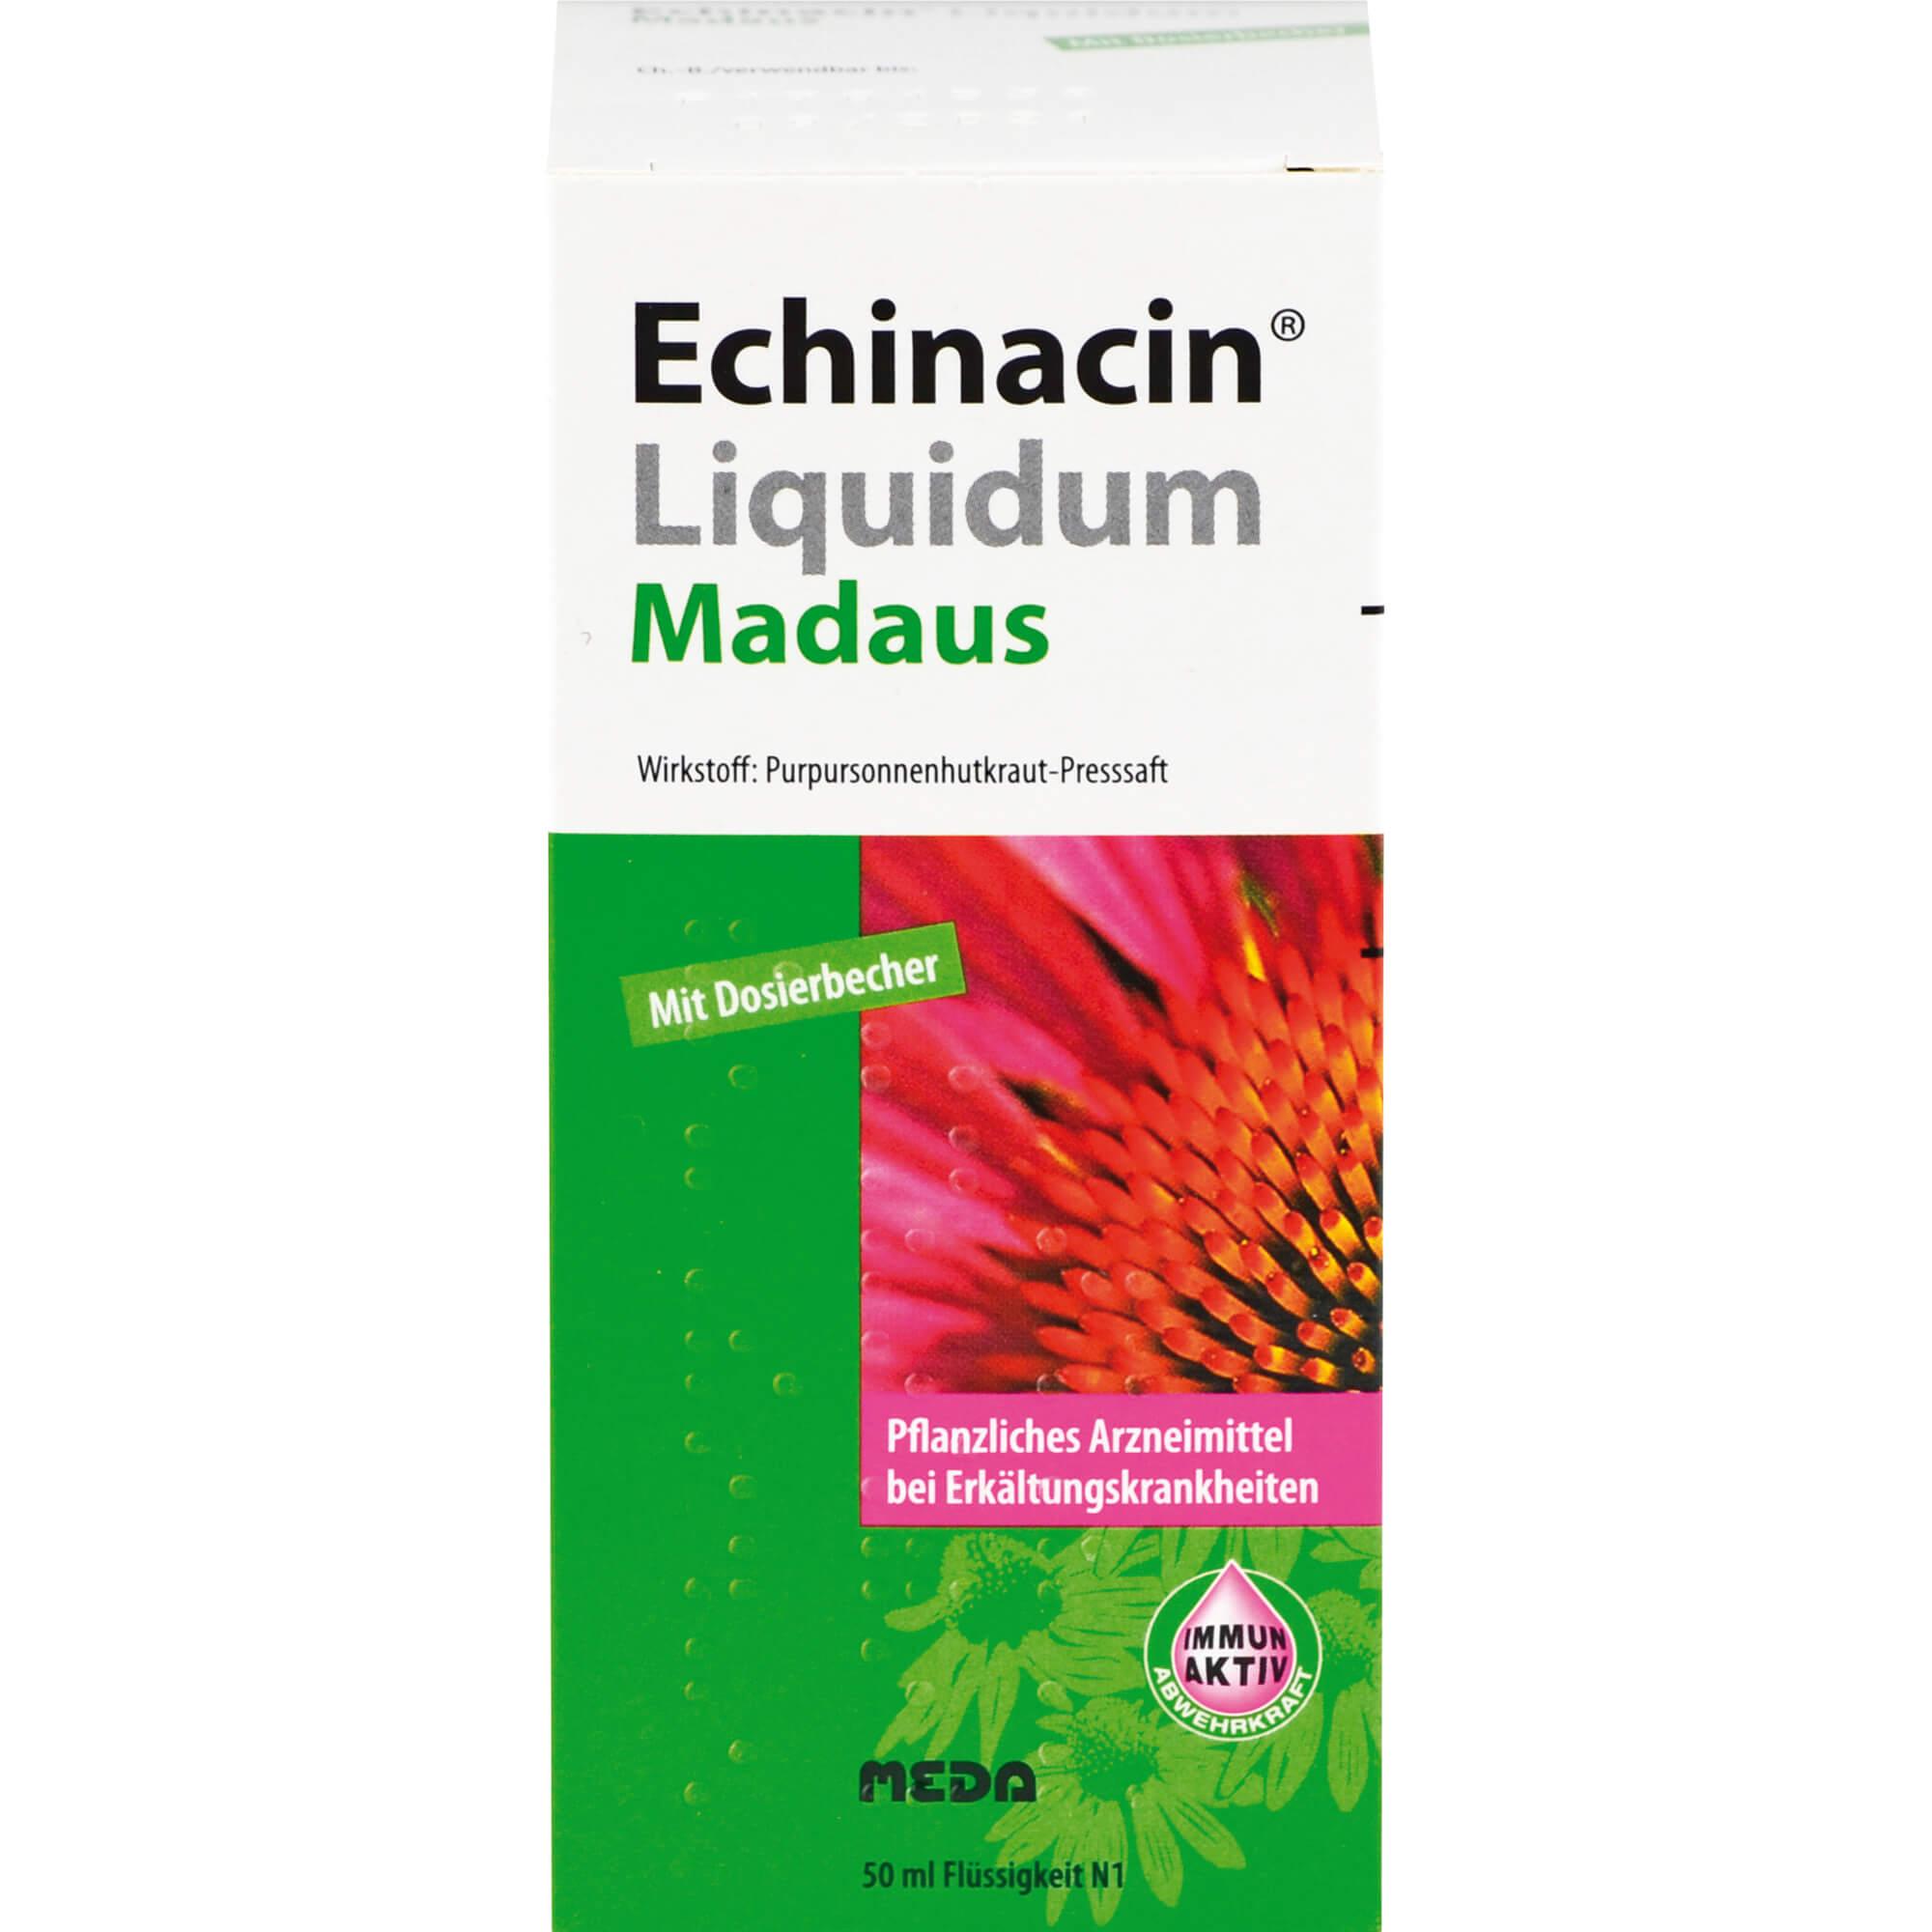 ECHINACIN-Liquidum